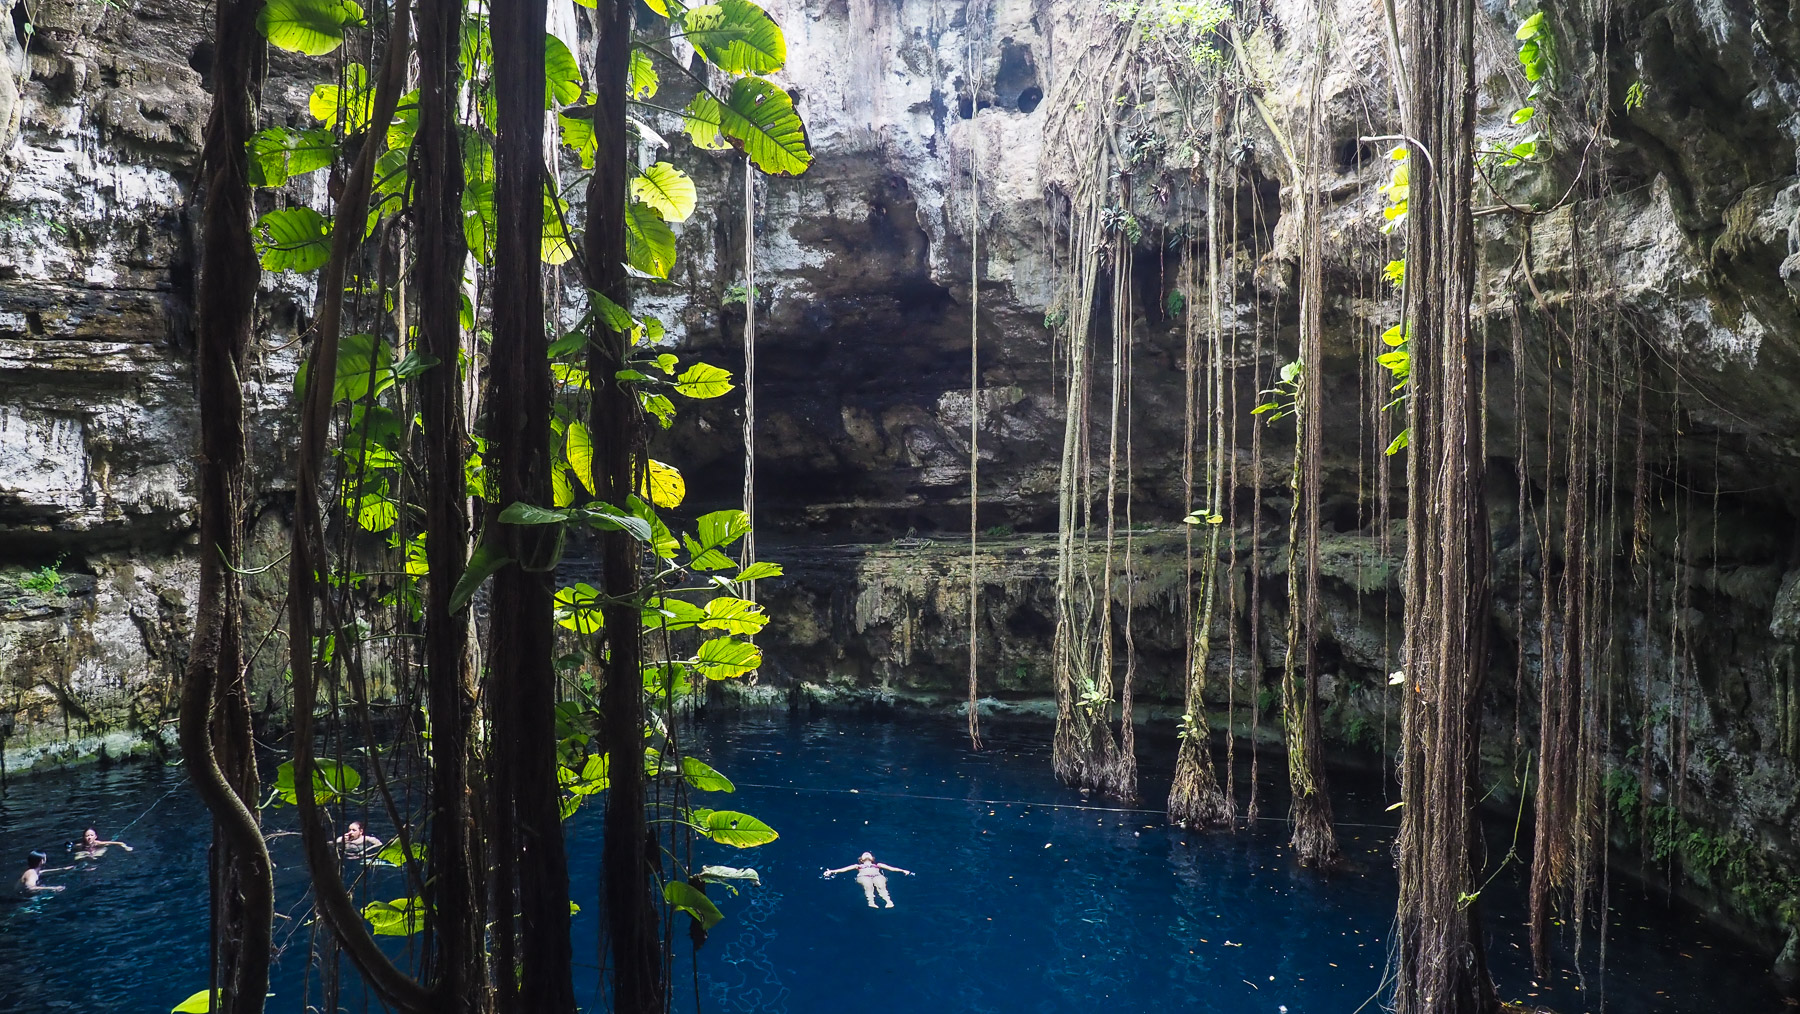 Wunderschöne Cenote Ozman